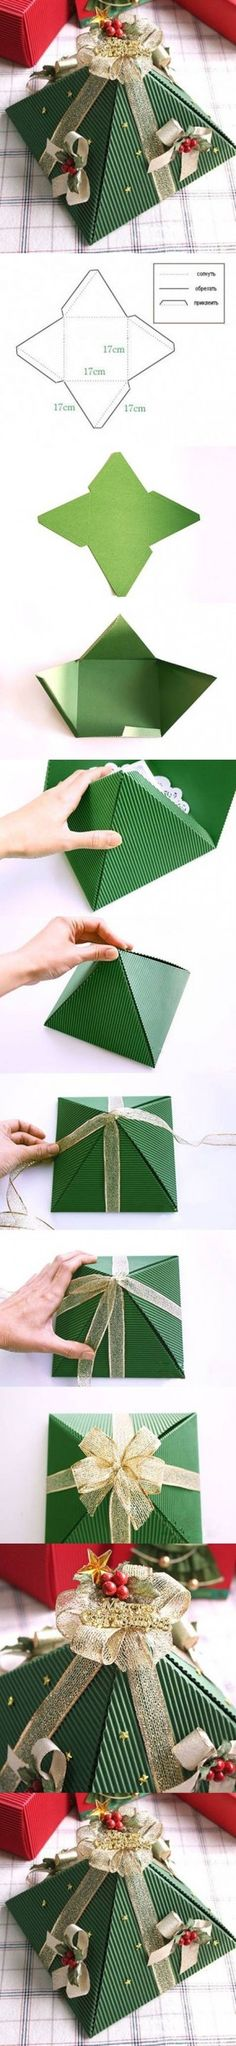 DIY Pyramid Christmas Box DIY Projects